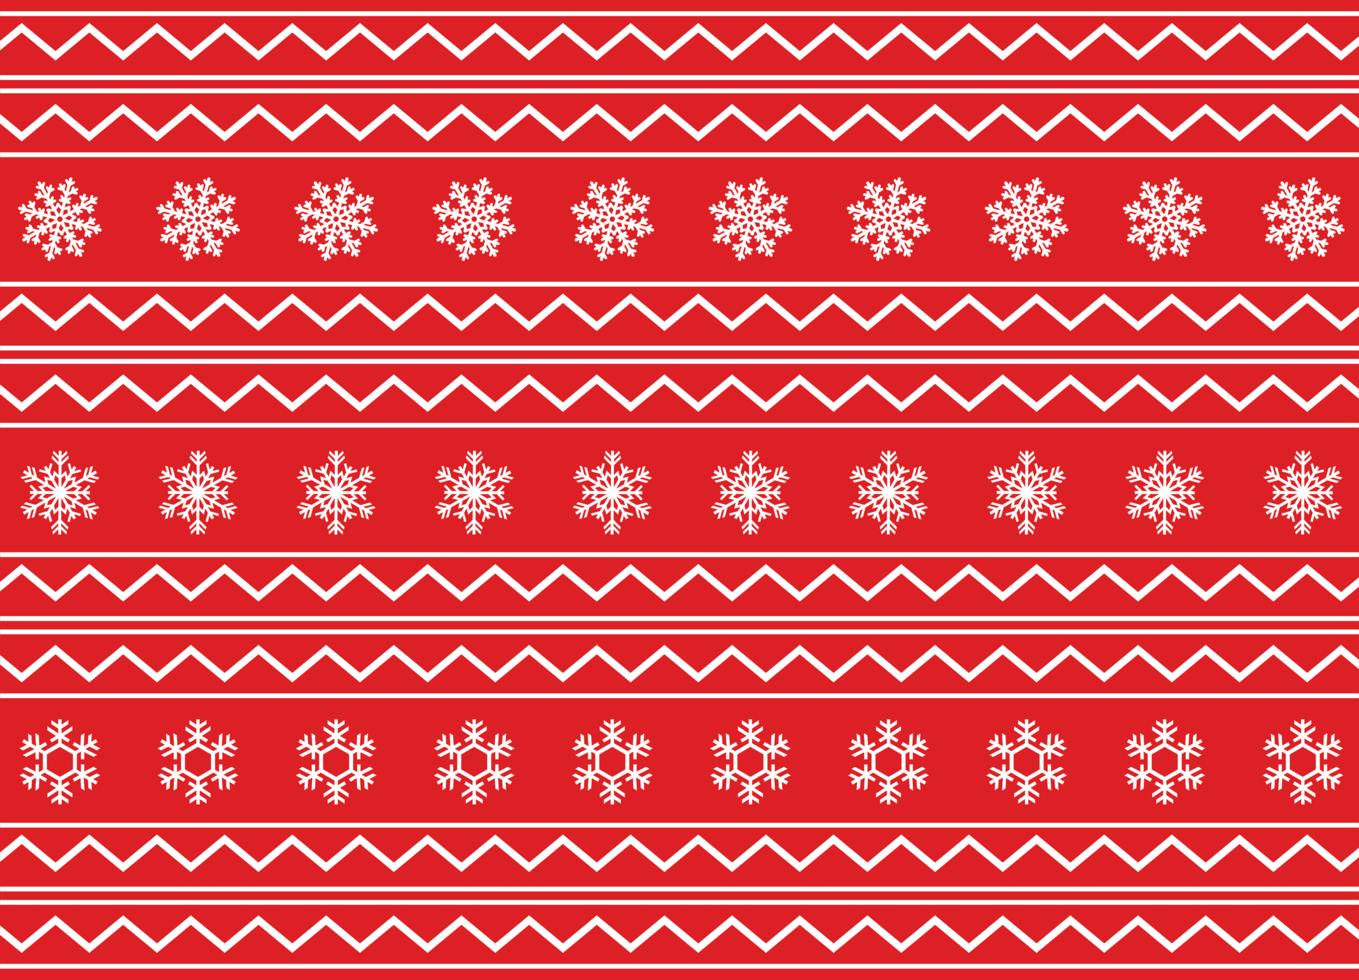 nahtloses Weihnachtsmuster vektor